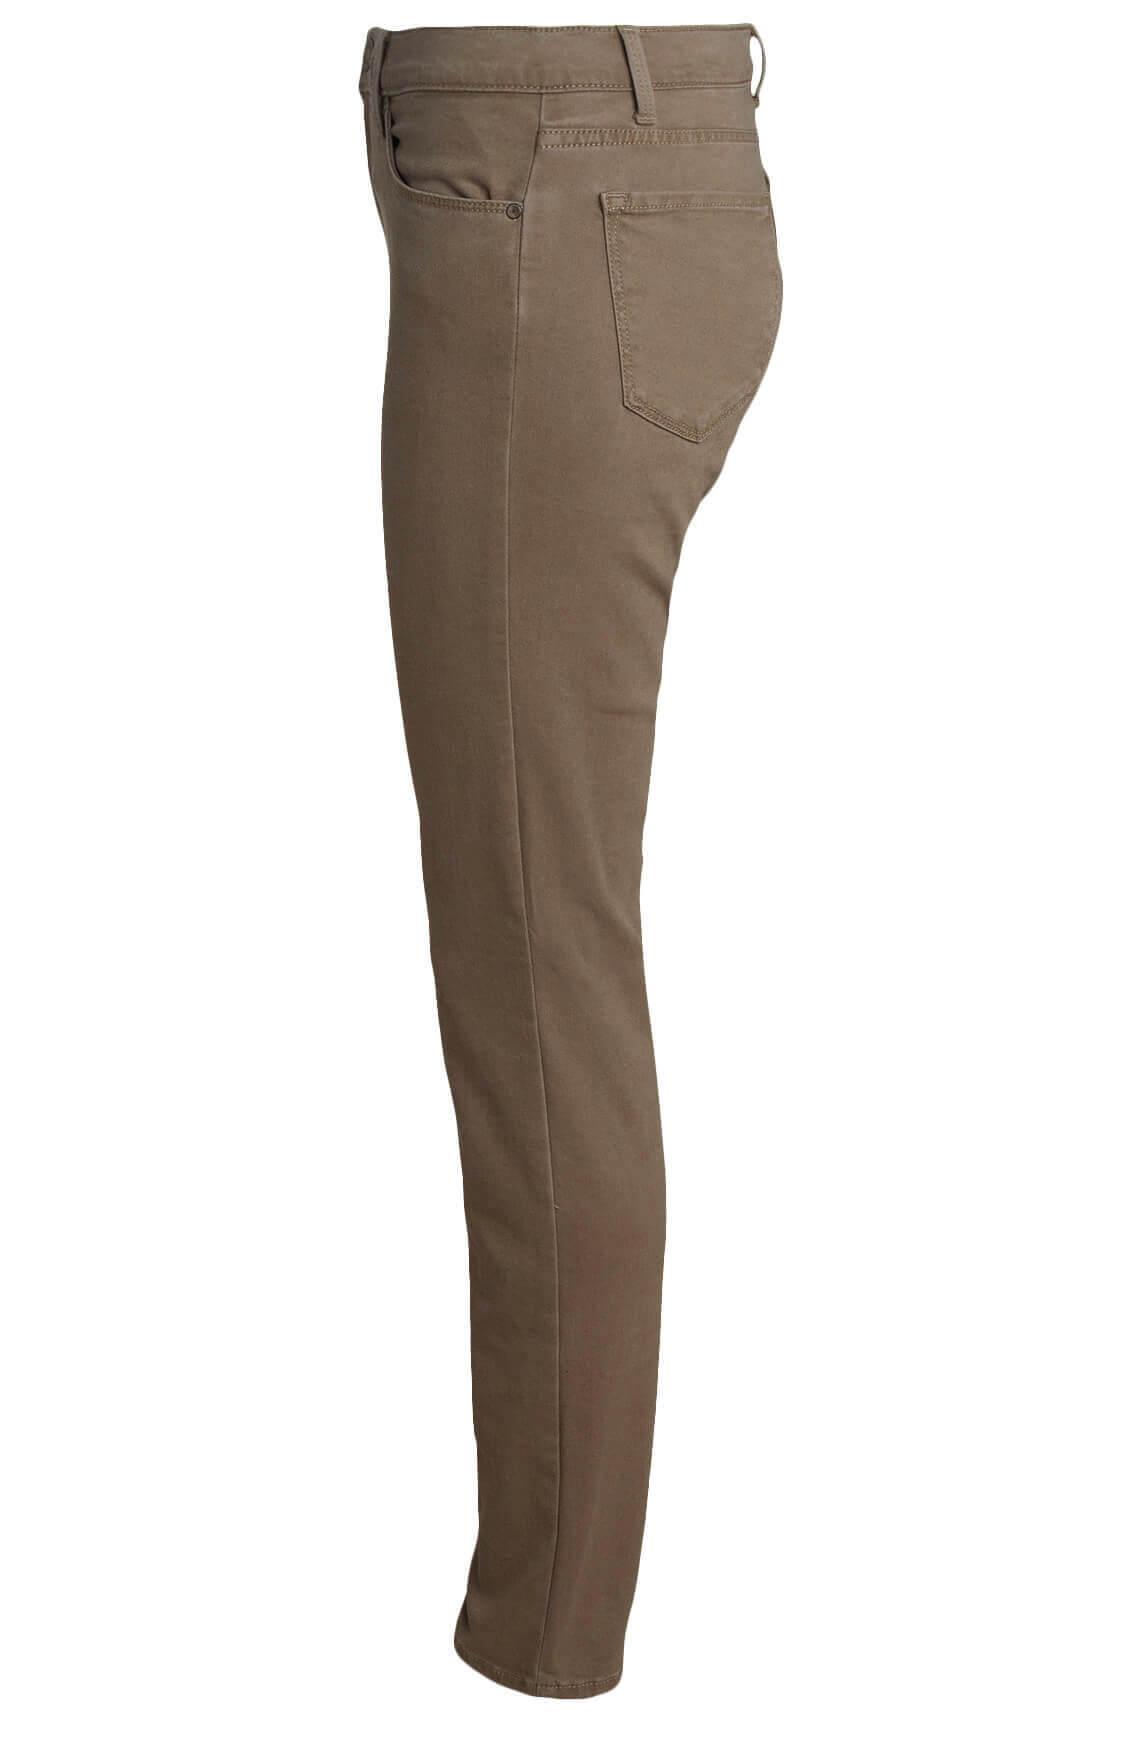 Brax Dames Shakira jeans Bruin